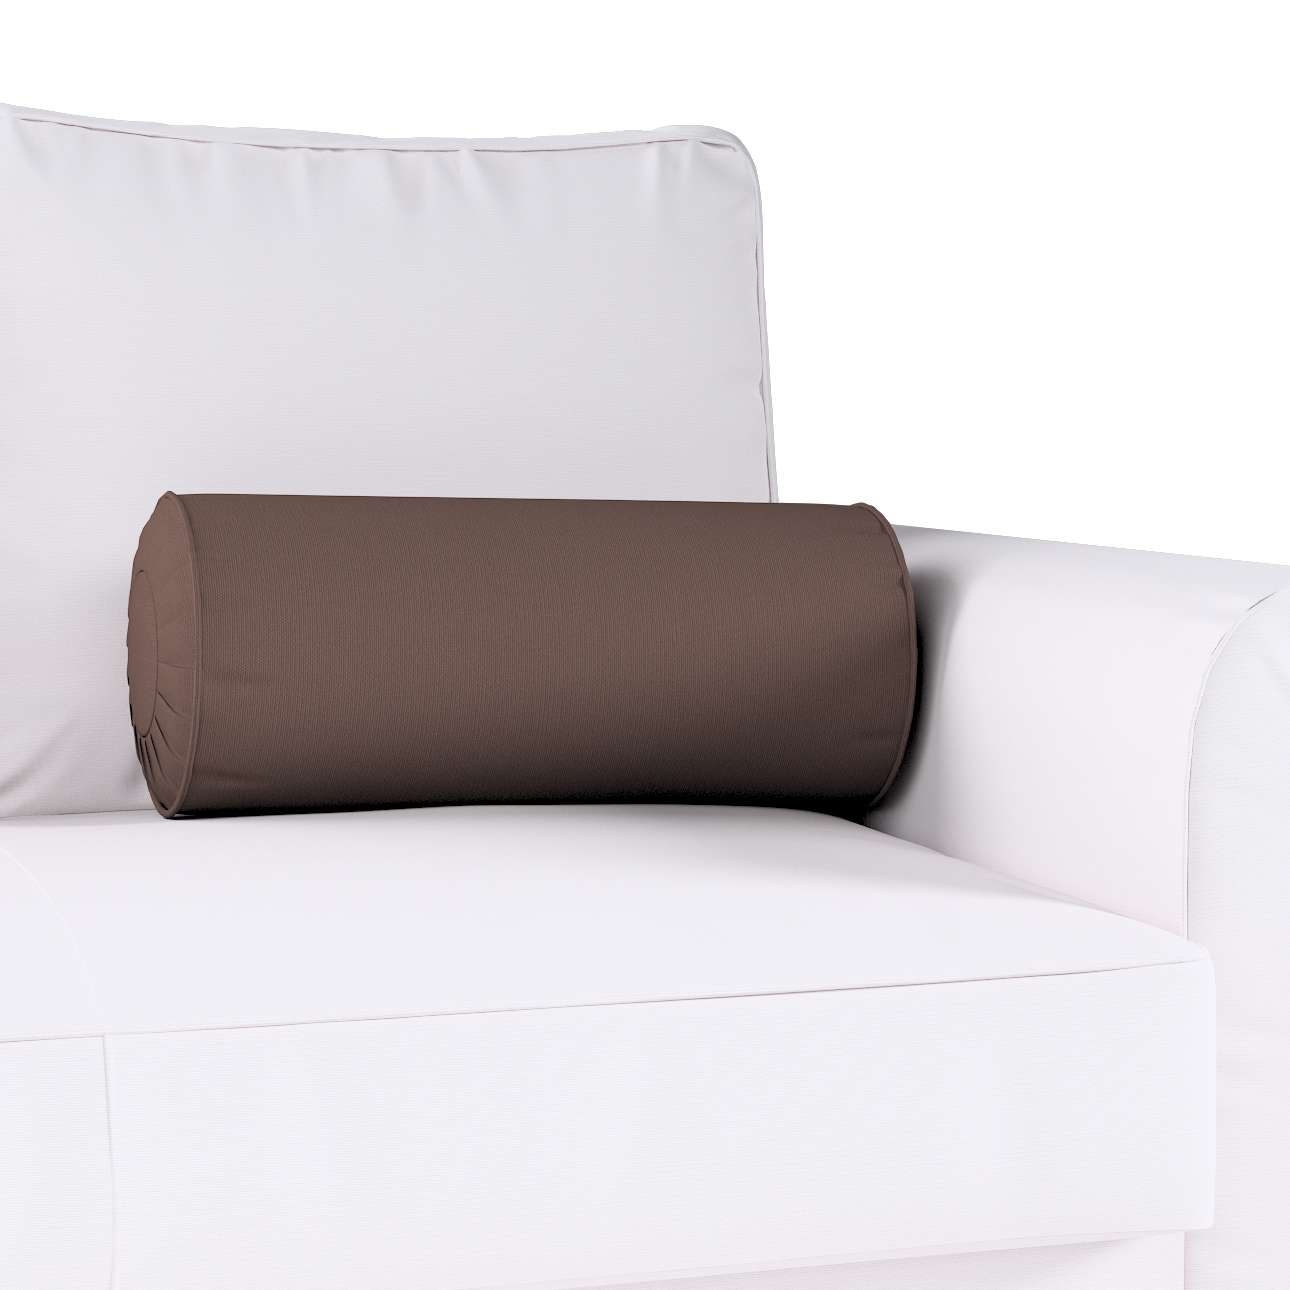 Nackkudde - pliserad kant Ø 20 × 50 cm i kollektionen Panama Cotton , Tyg: 702-03